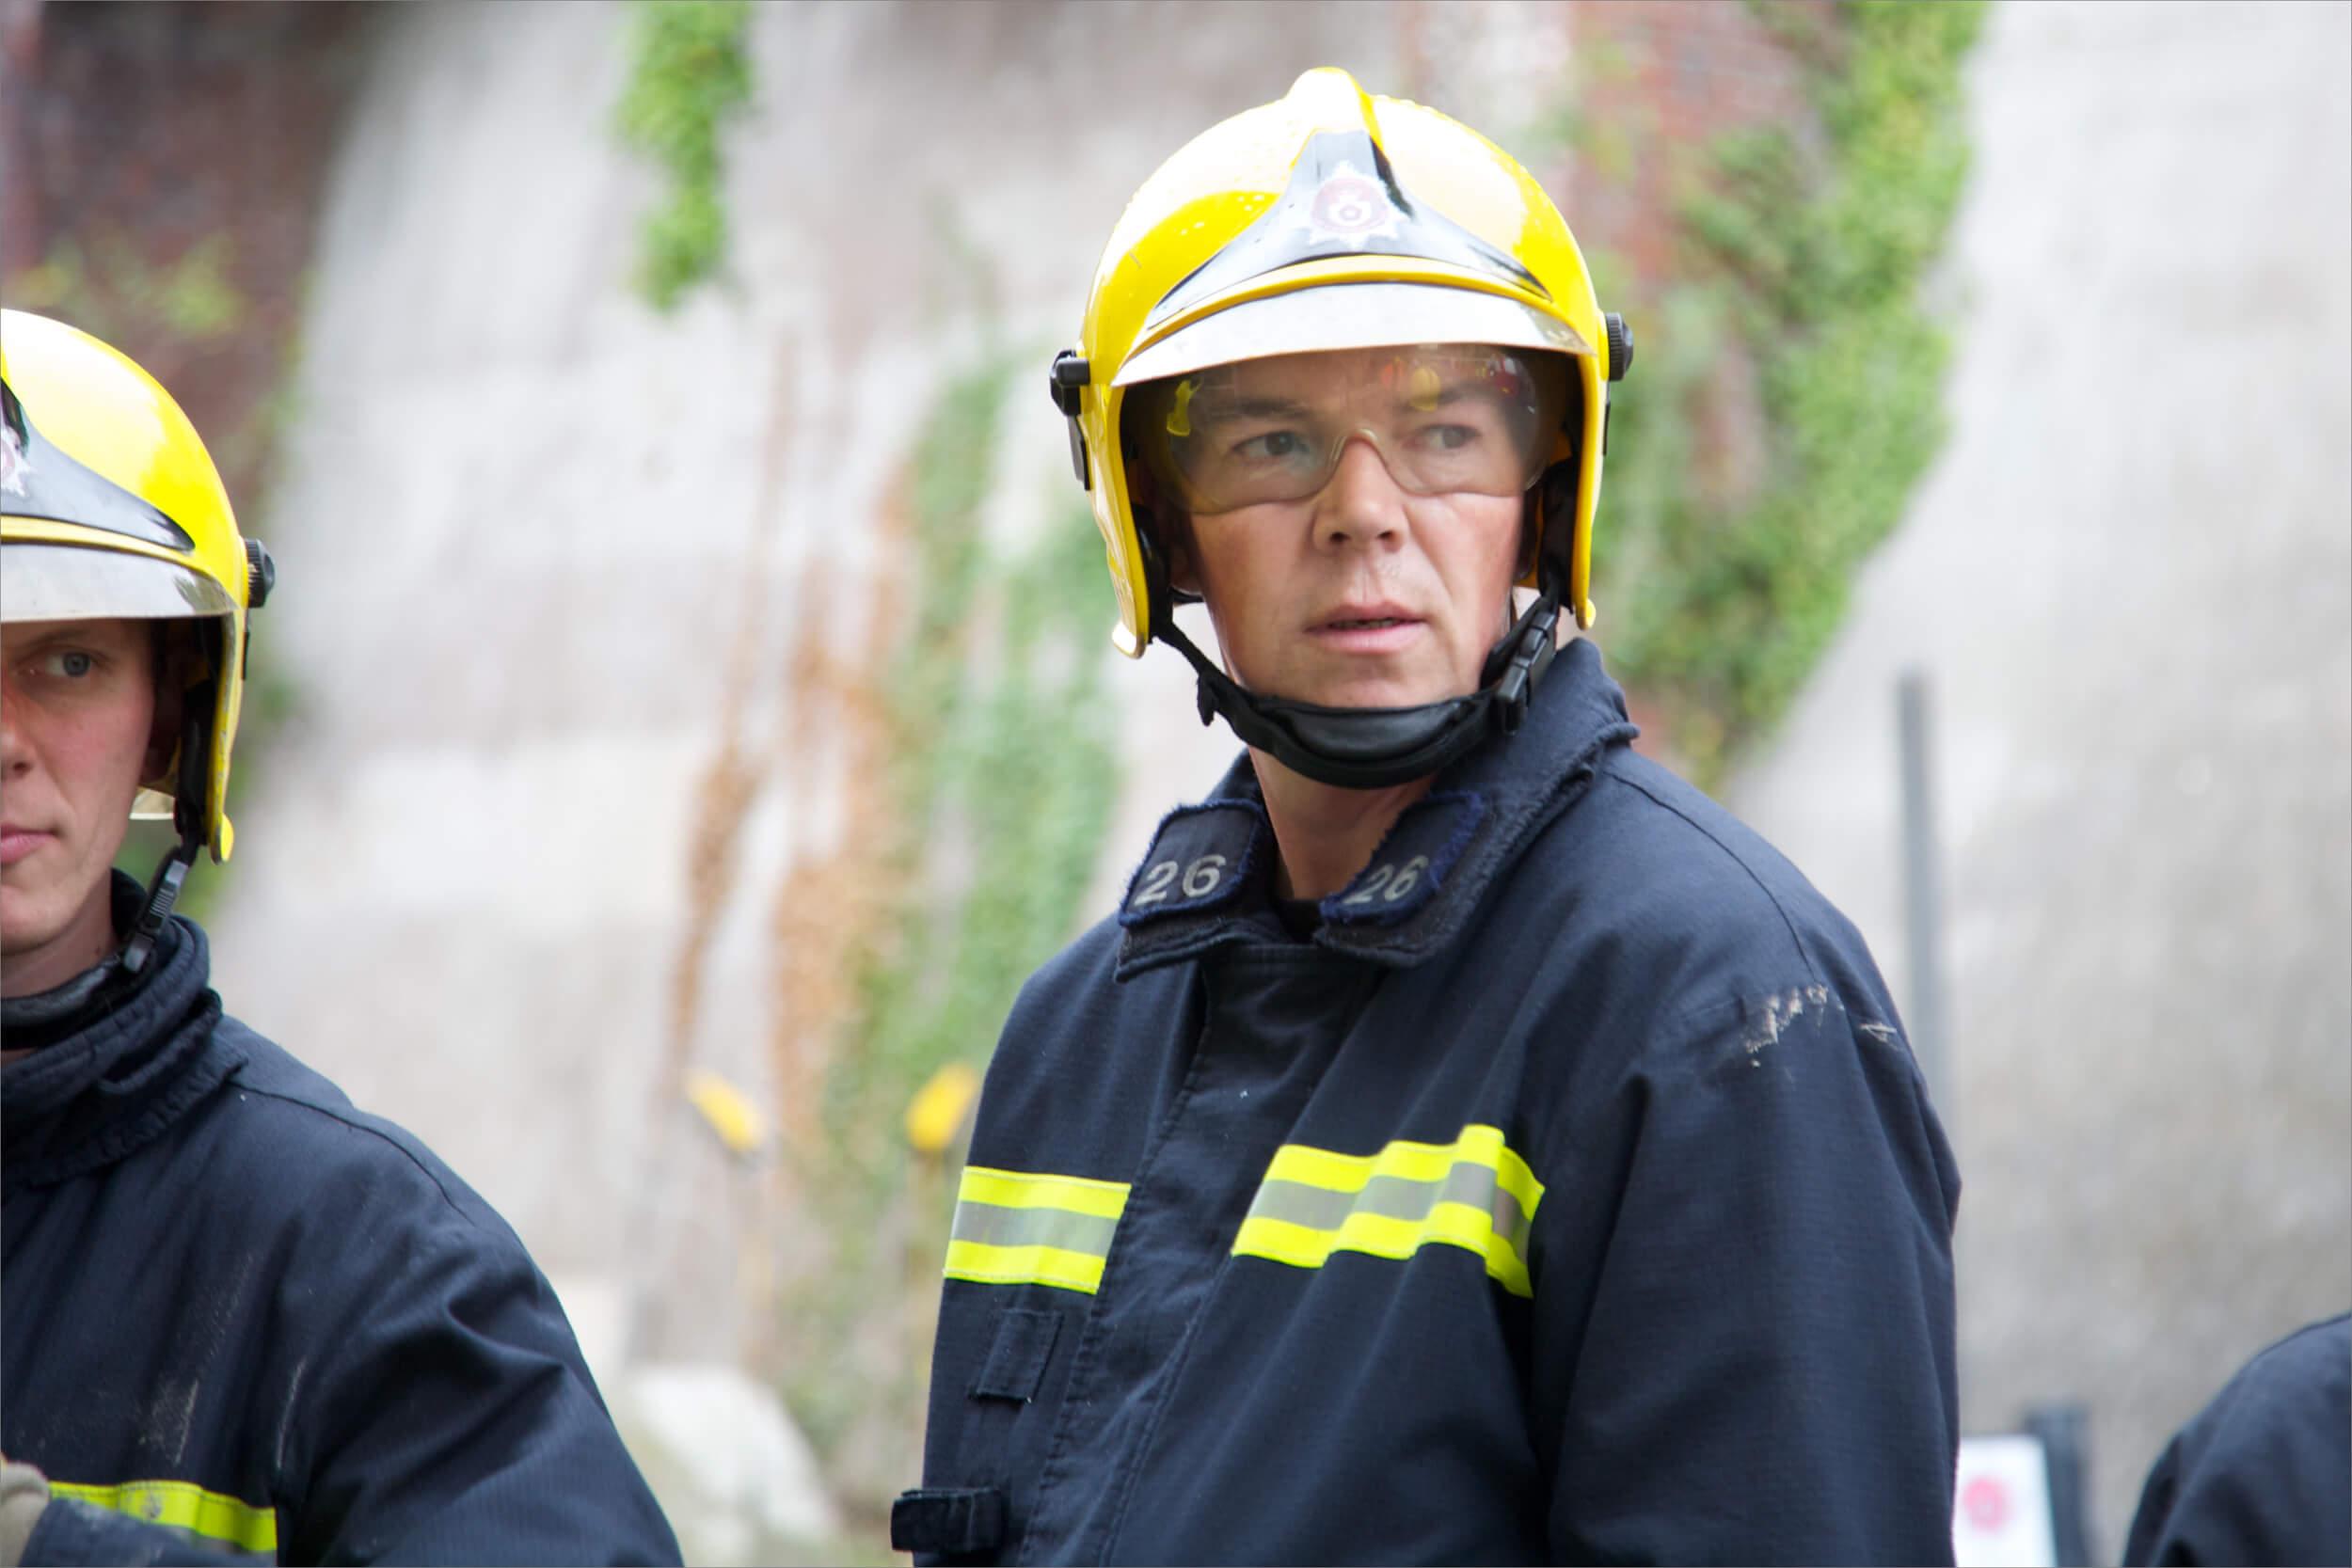 jwt-hampshire-fire-rescue-nokia-reportage-katie-hyams-03._m.jpg